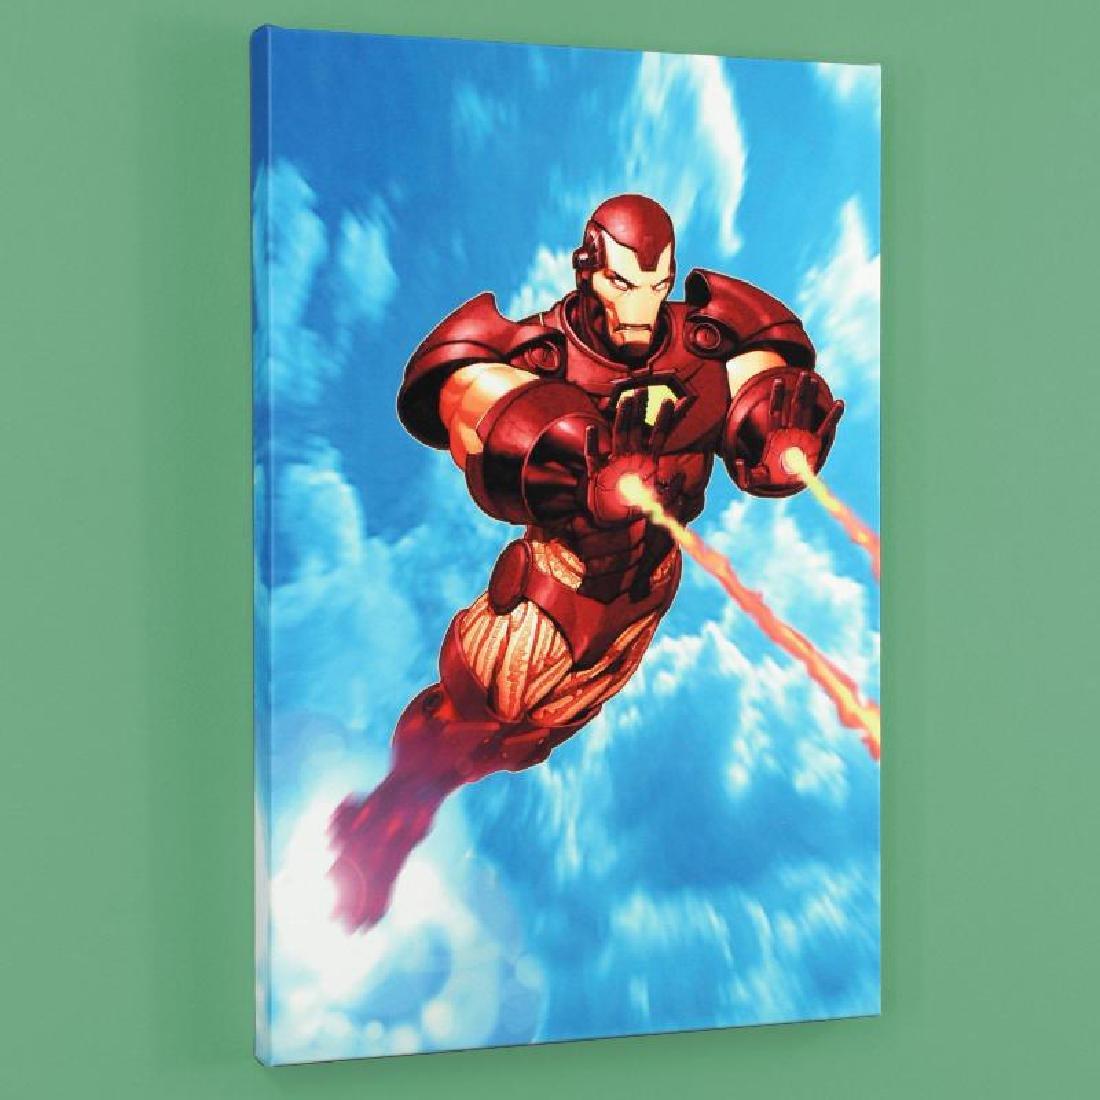 """Iron Man: Iron Protocols #1"" Limited Edition Giclee on"